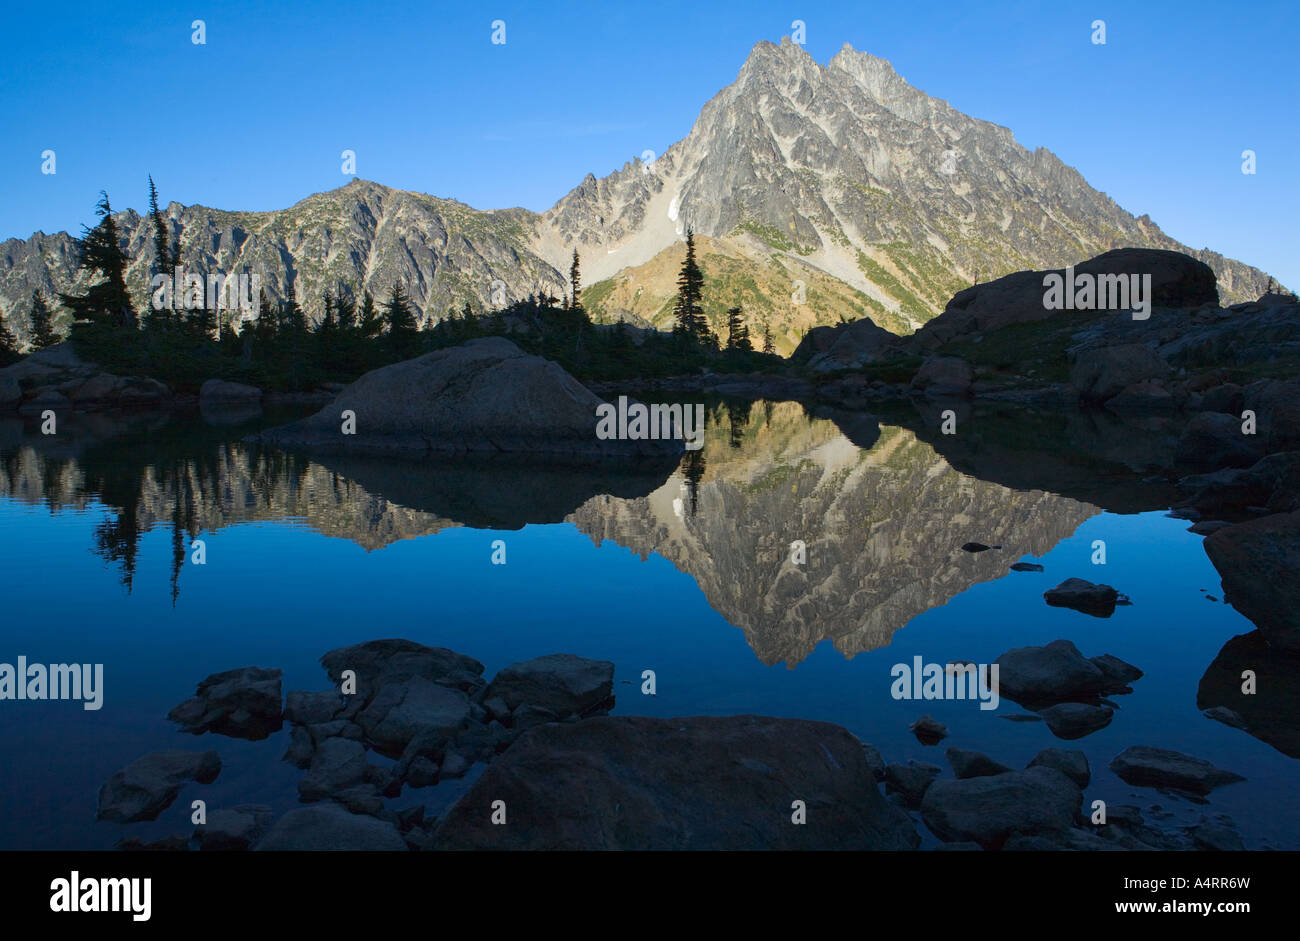 Mount Stuart reflected in still water of Ingalls Lake Central Cascades Washington USA Stock Photo